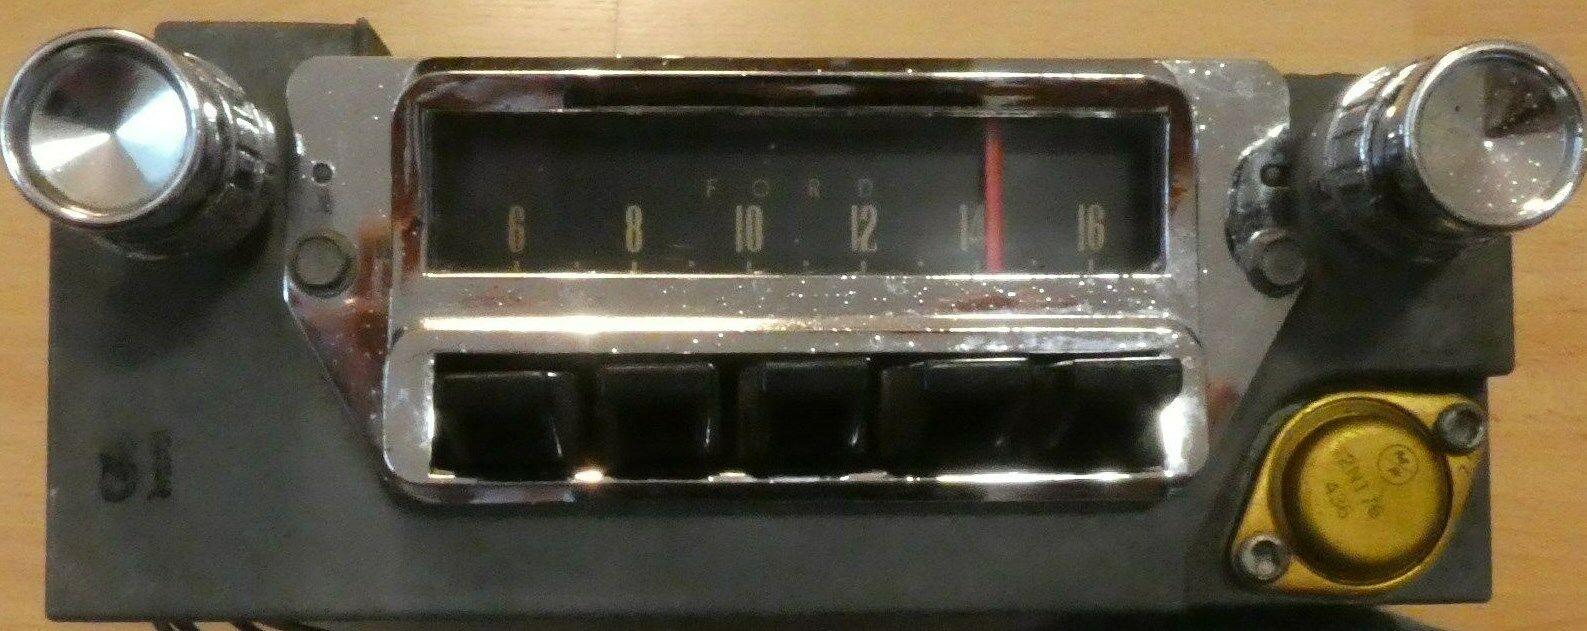 Original Equipment Manufacture 1965 Ford Mustang AM radio